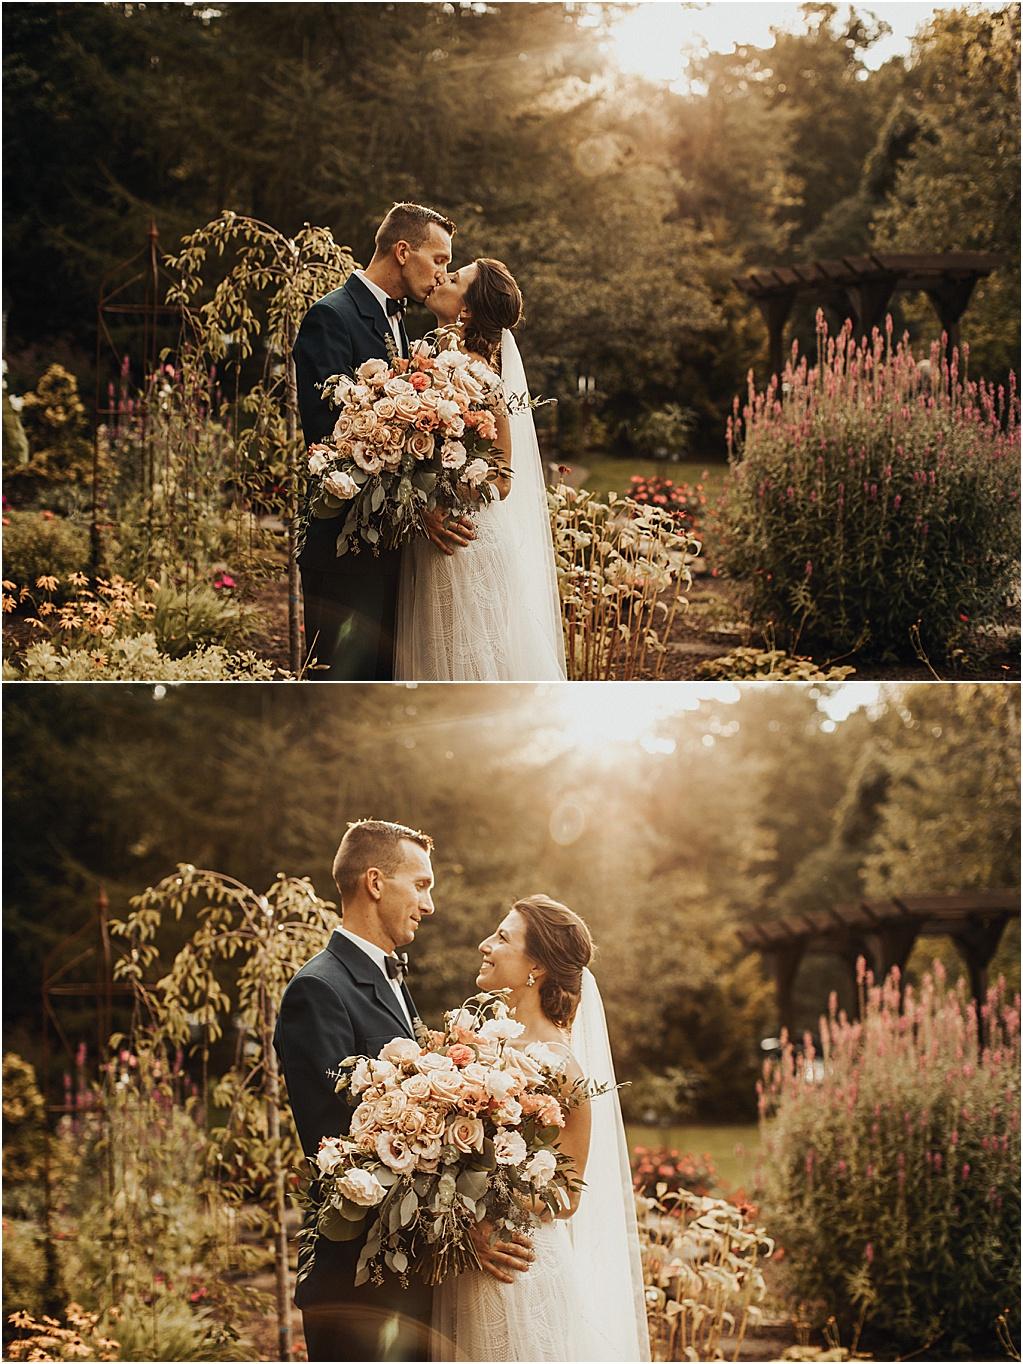 brittany_boote_pennsylvania_wedding_photographer_0642.jpg